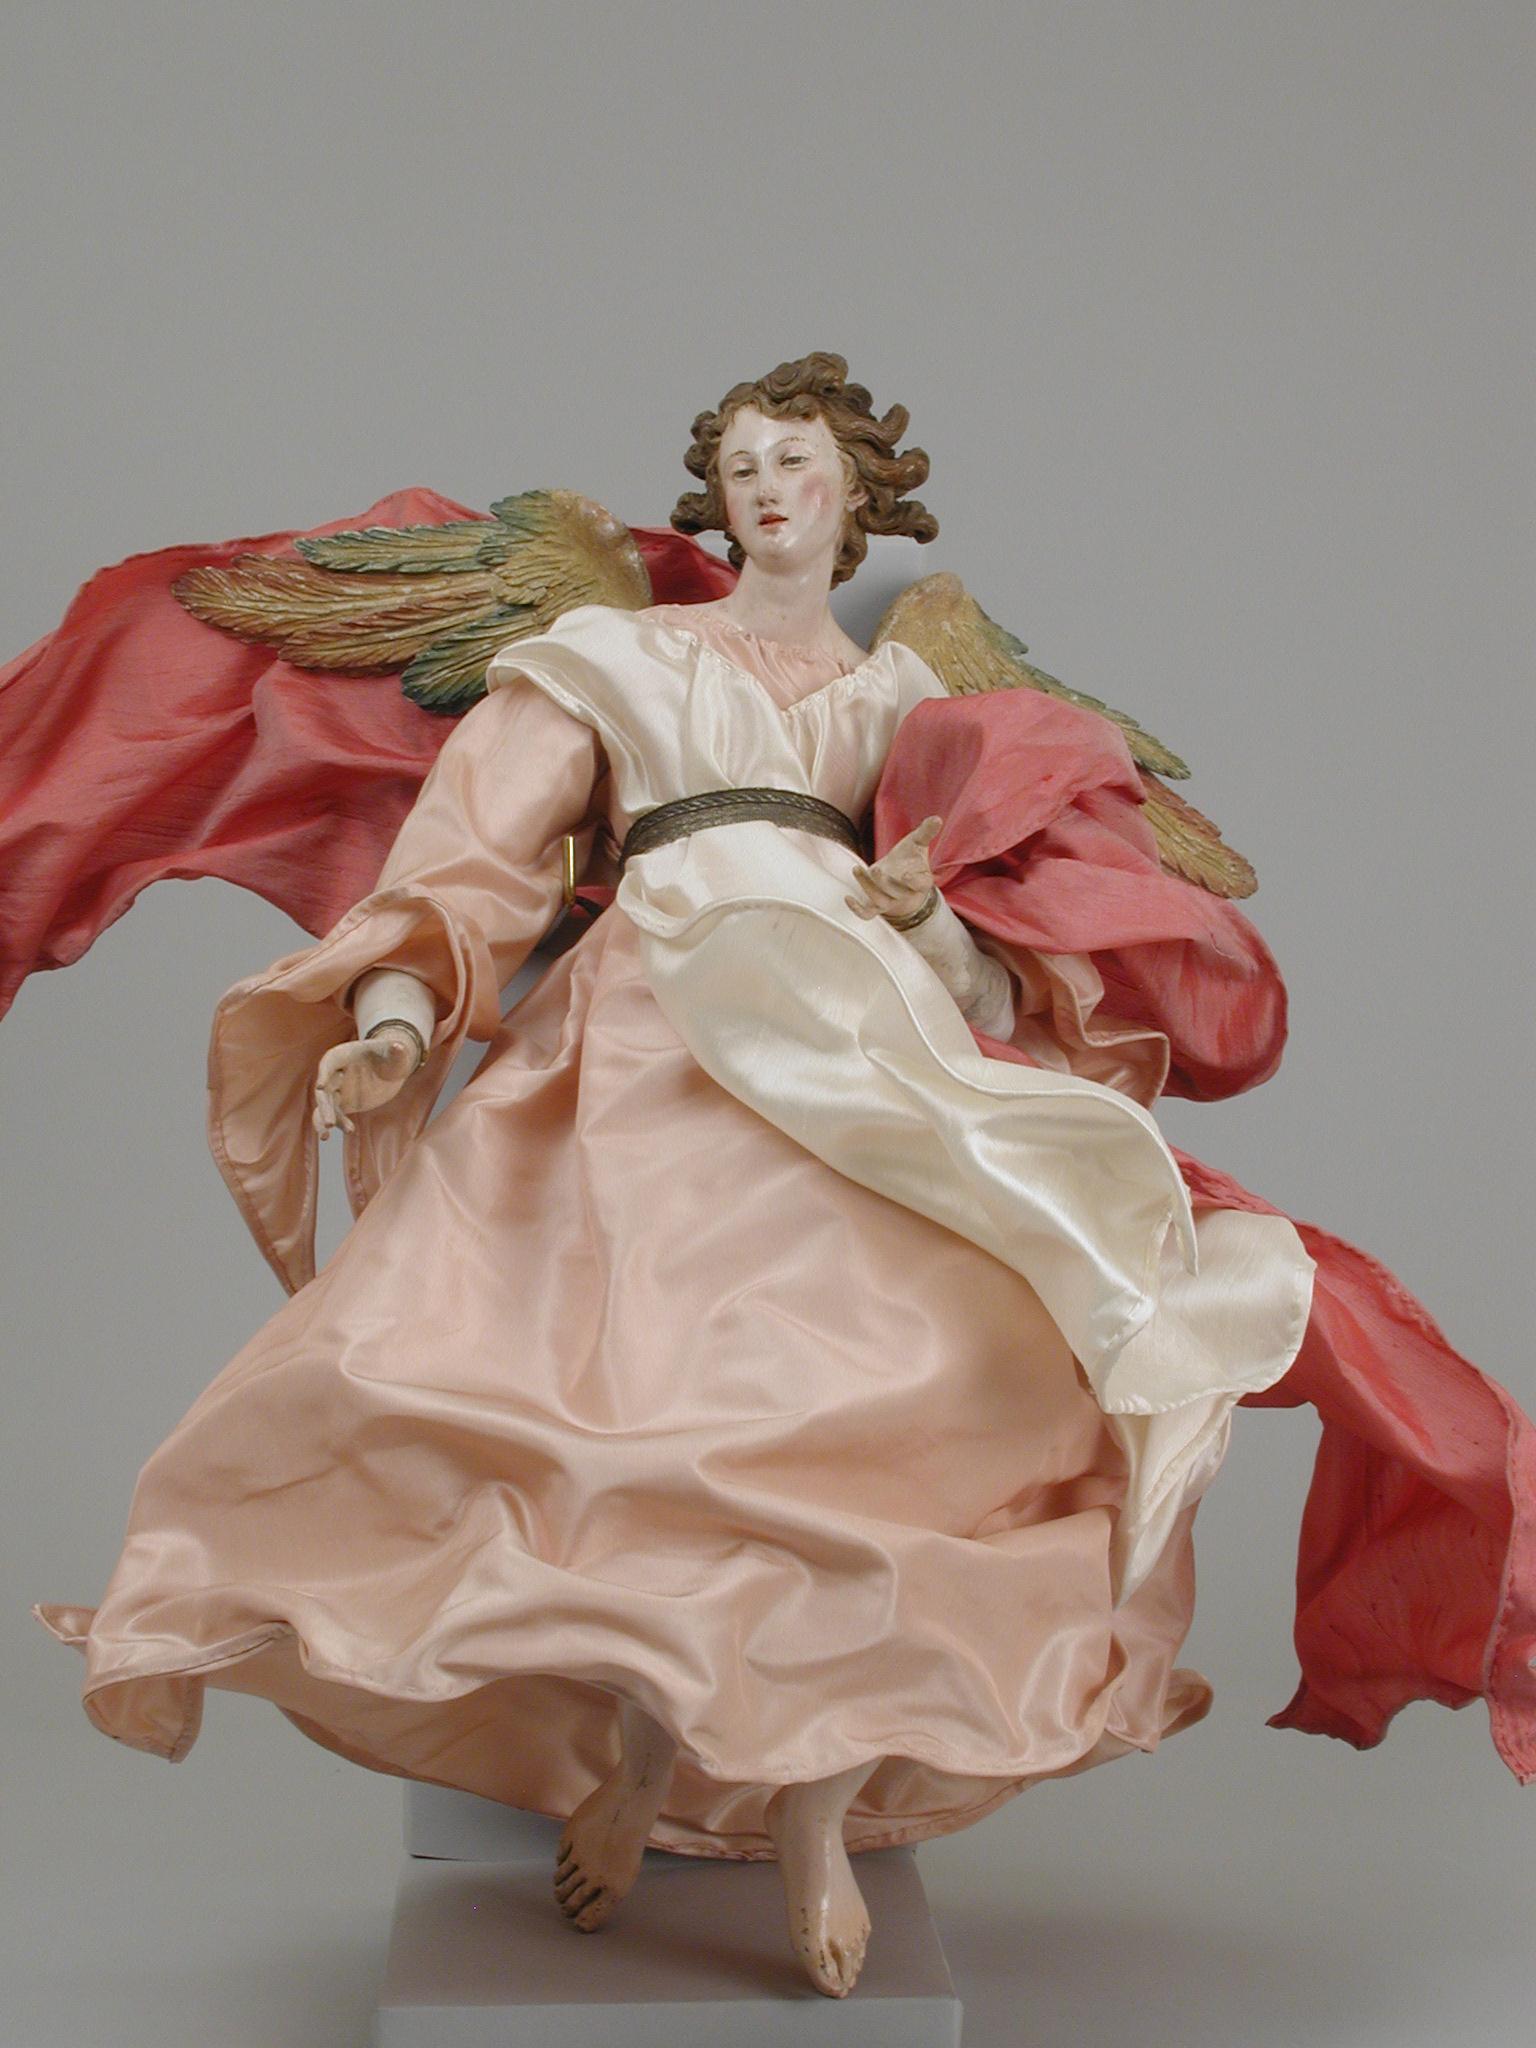 https://images.metmuseum.org/CRDImages/es/original/LC-64_164_16.jpg